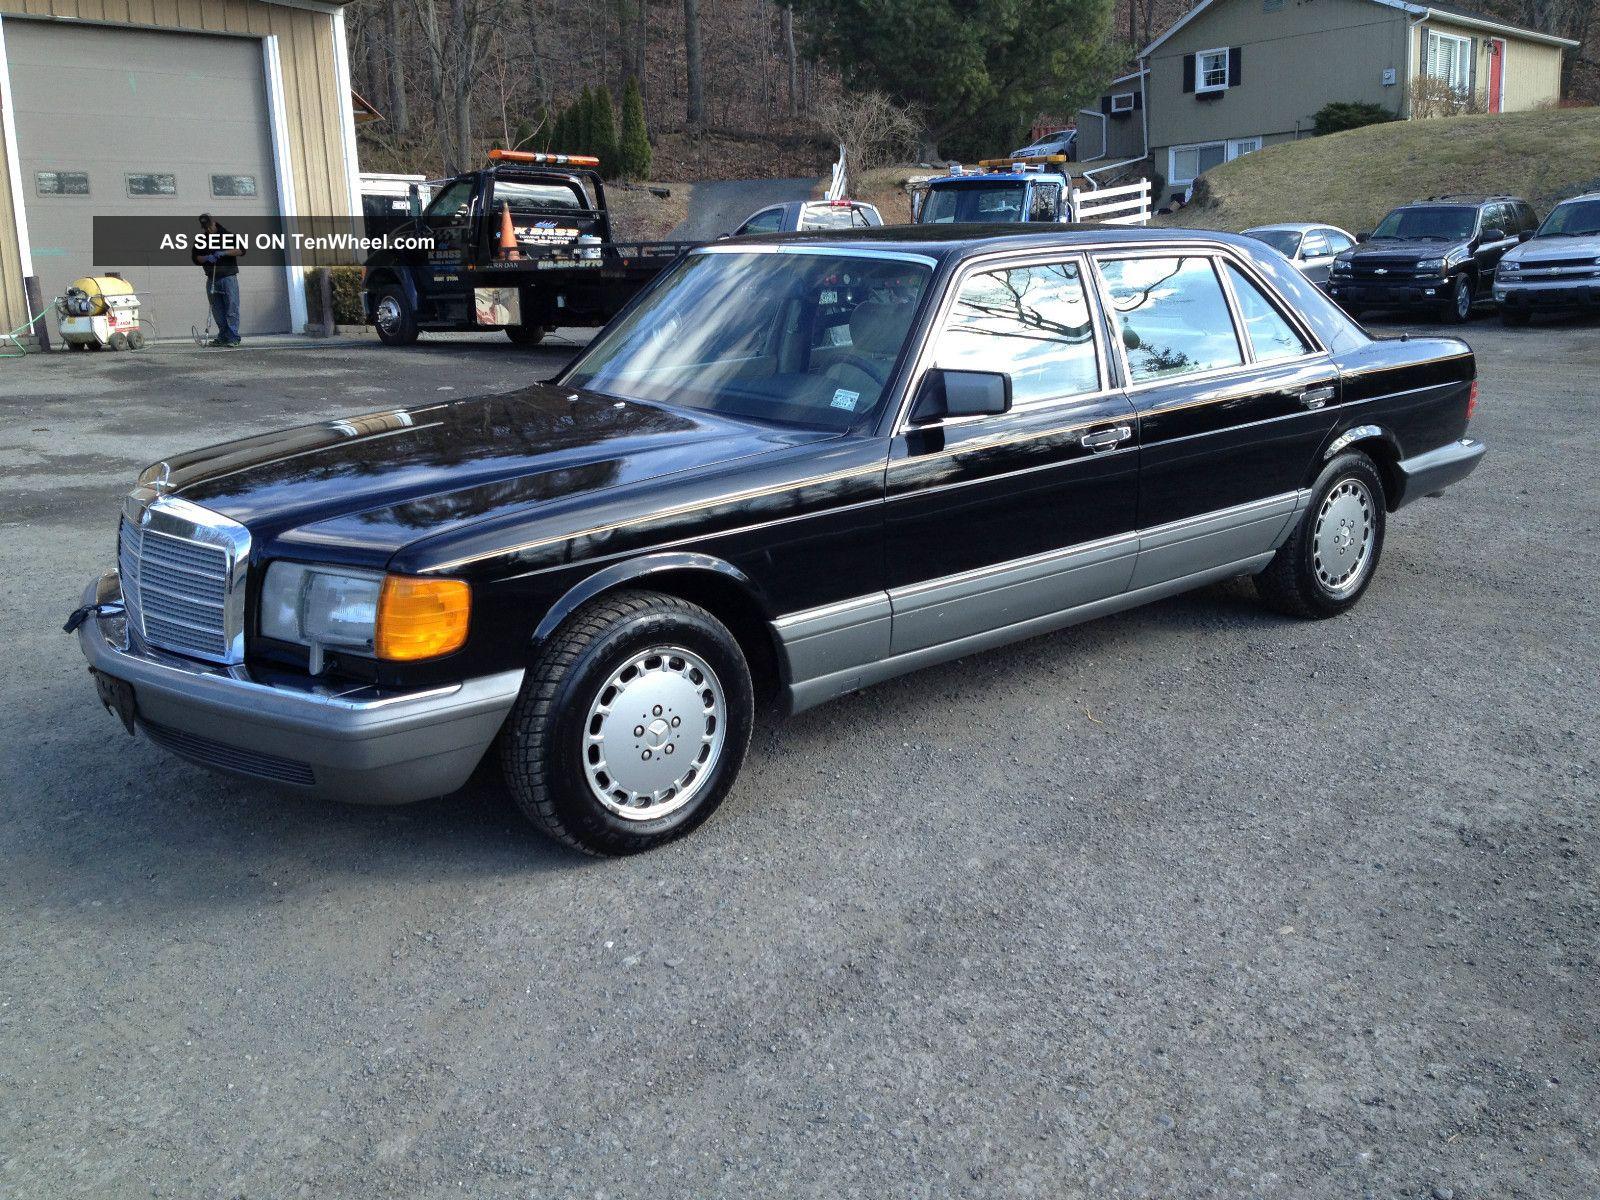 1988 Mercedes Benz 300 Sel S Cl Black on